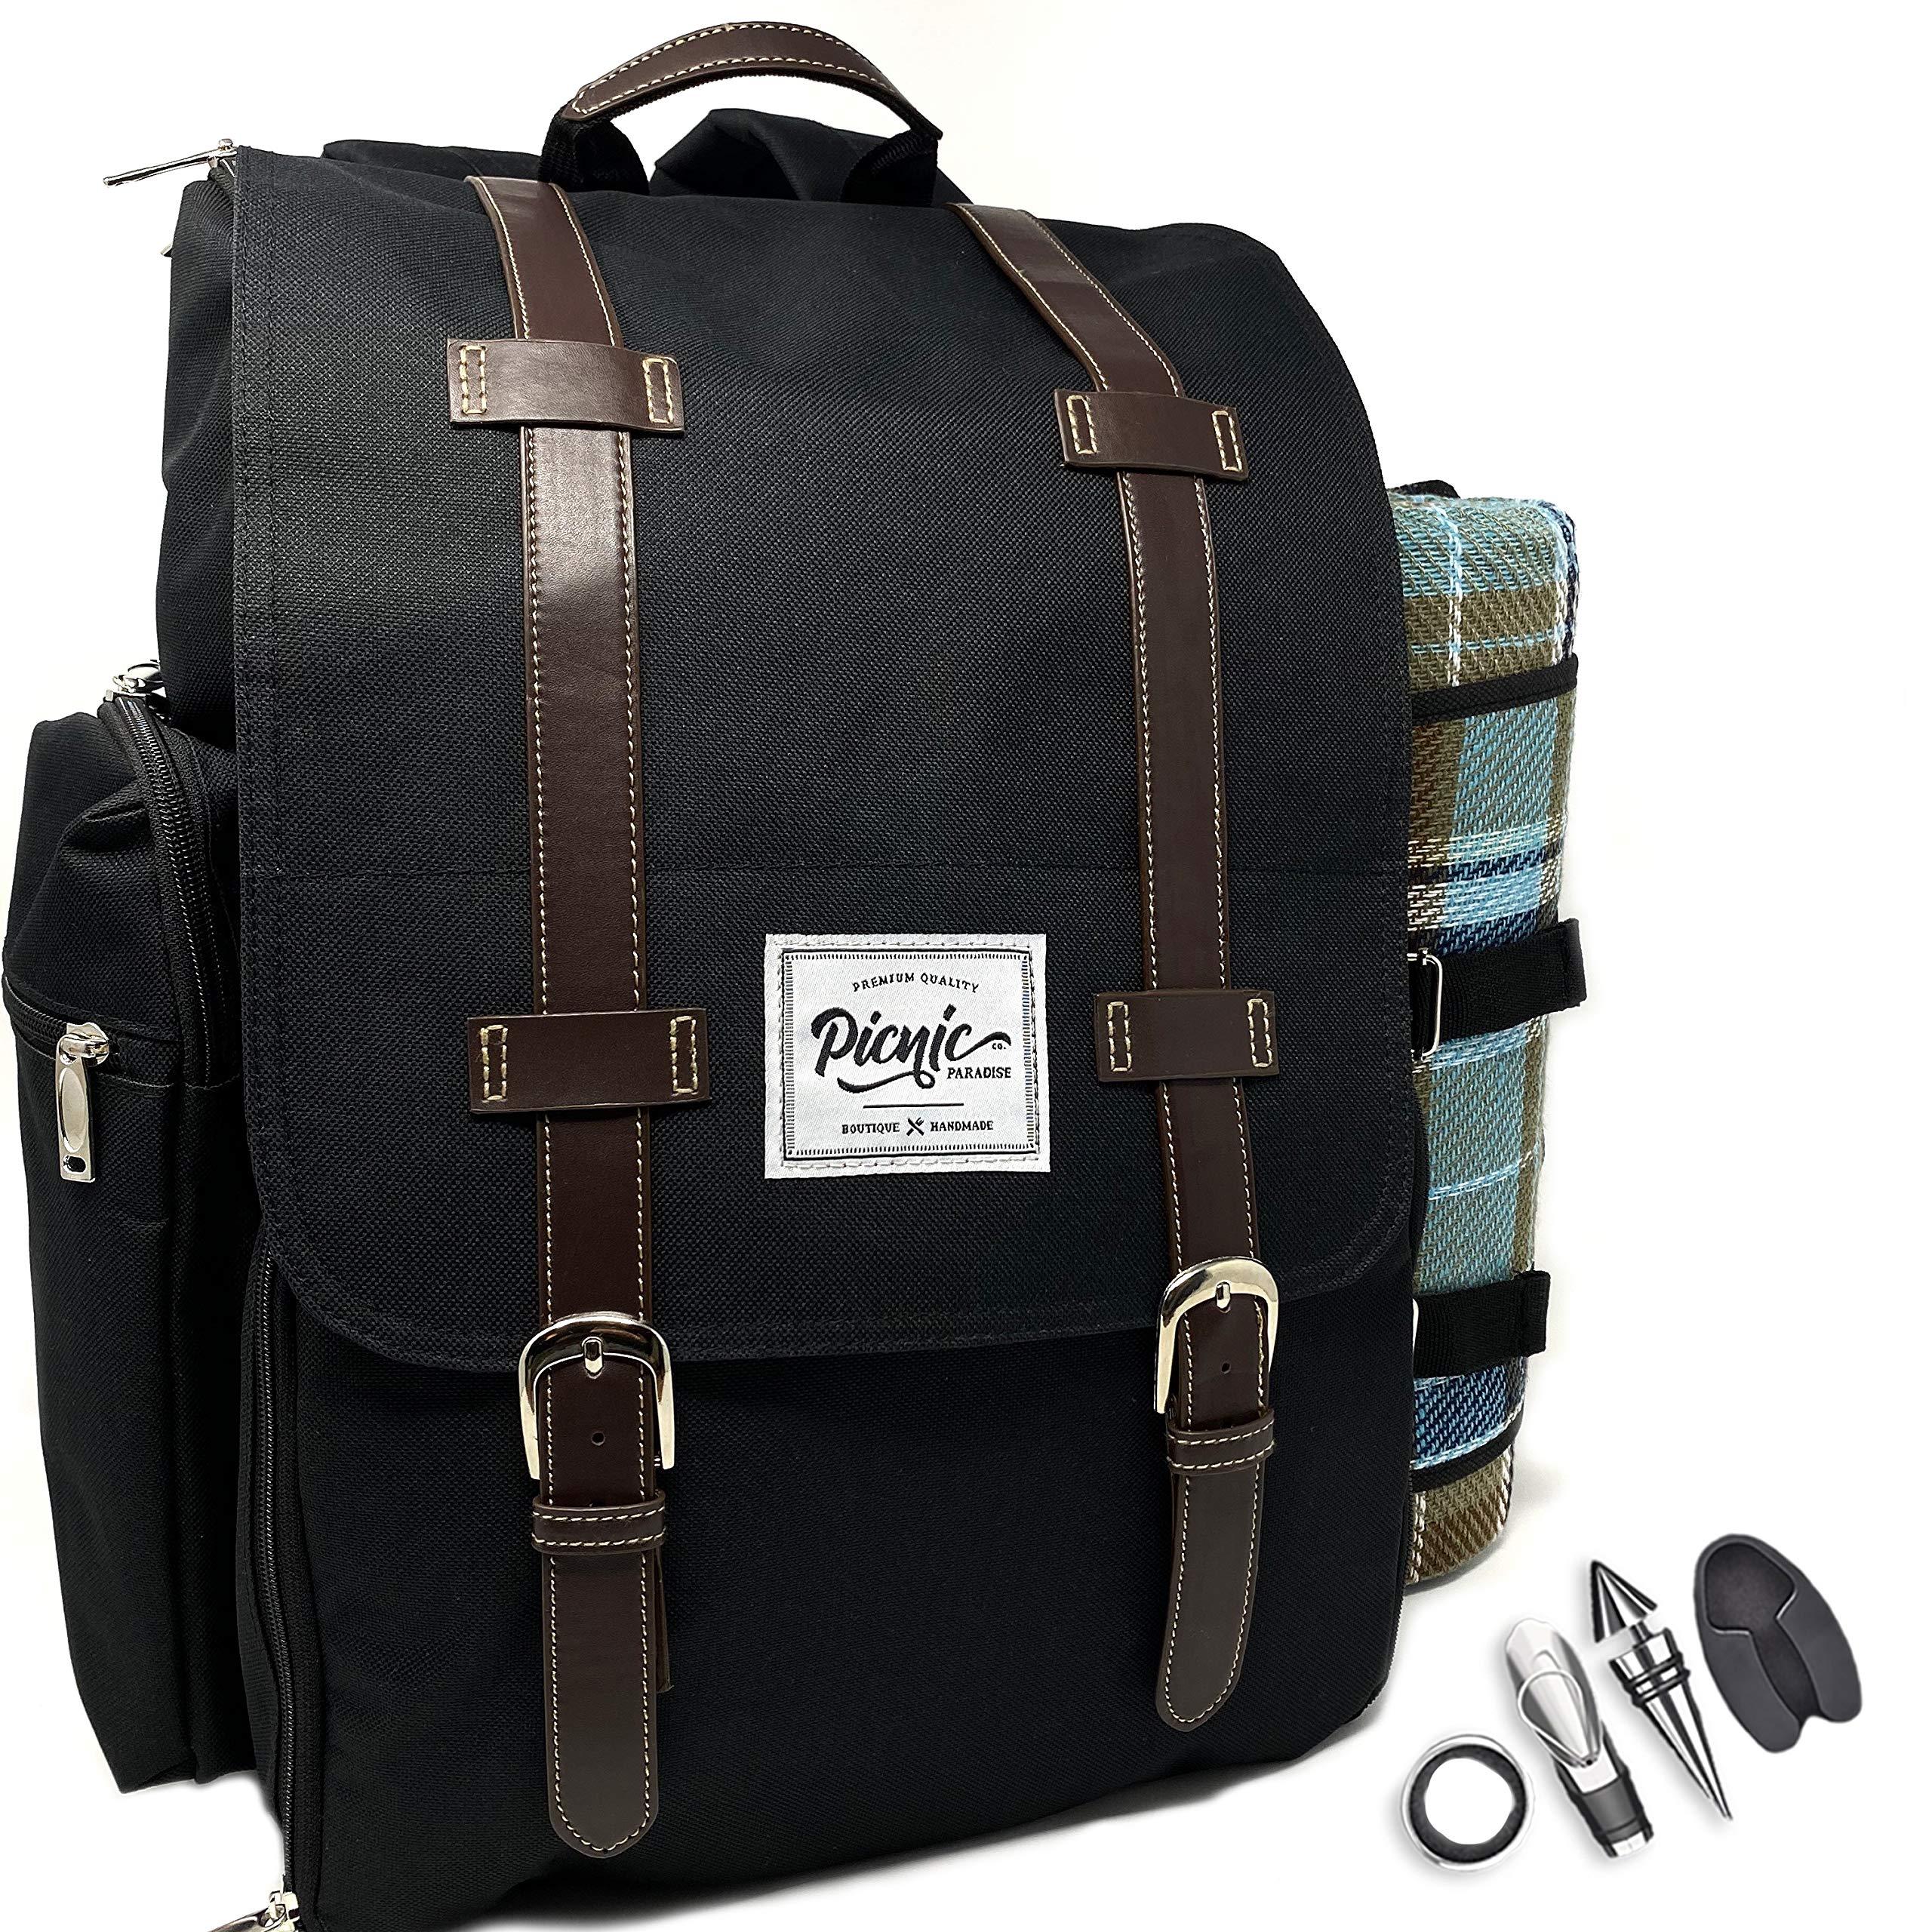 Picnic Paradise Co Backpack Waterproof